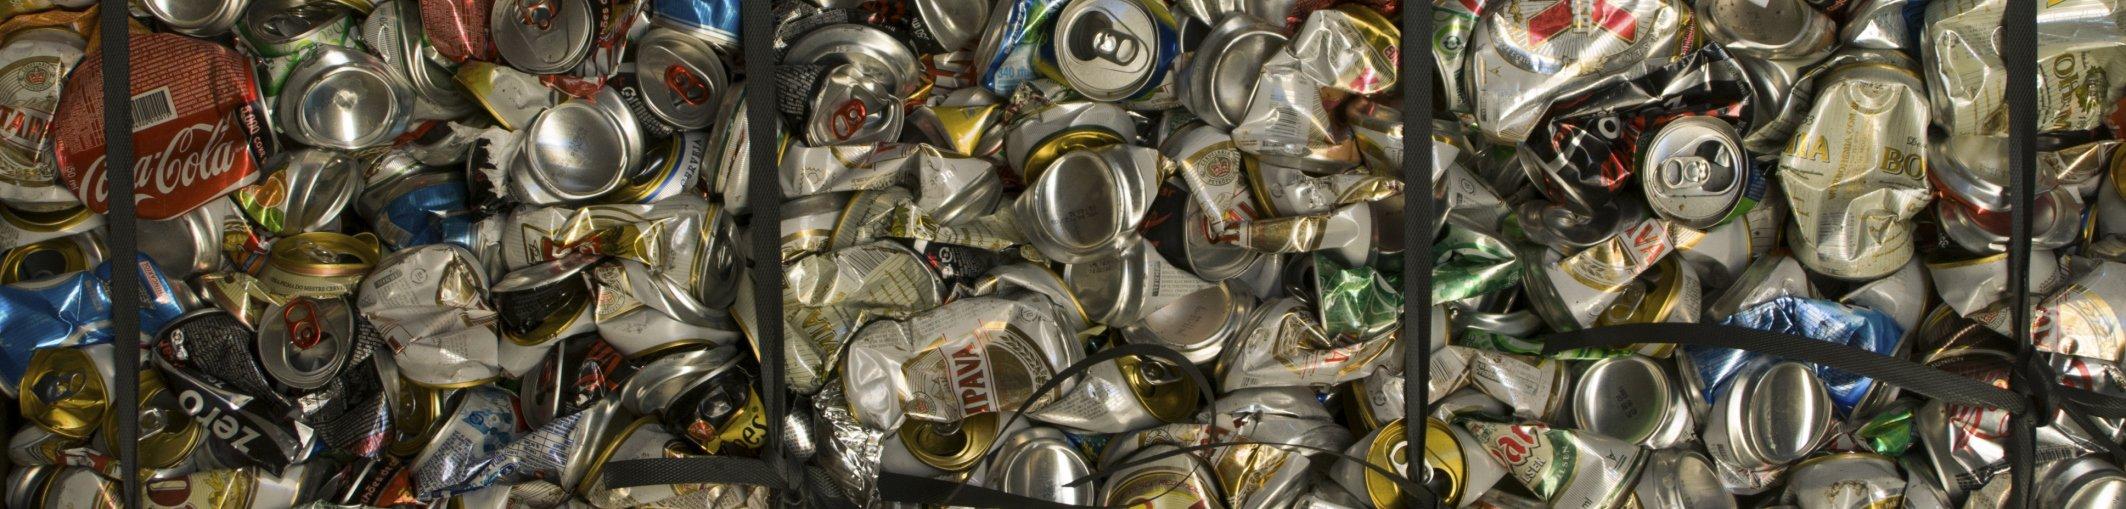 Waste Removal Services Bridgeport, CT